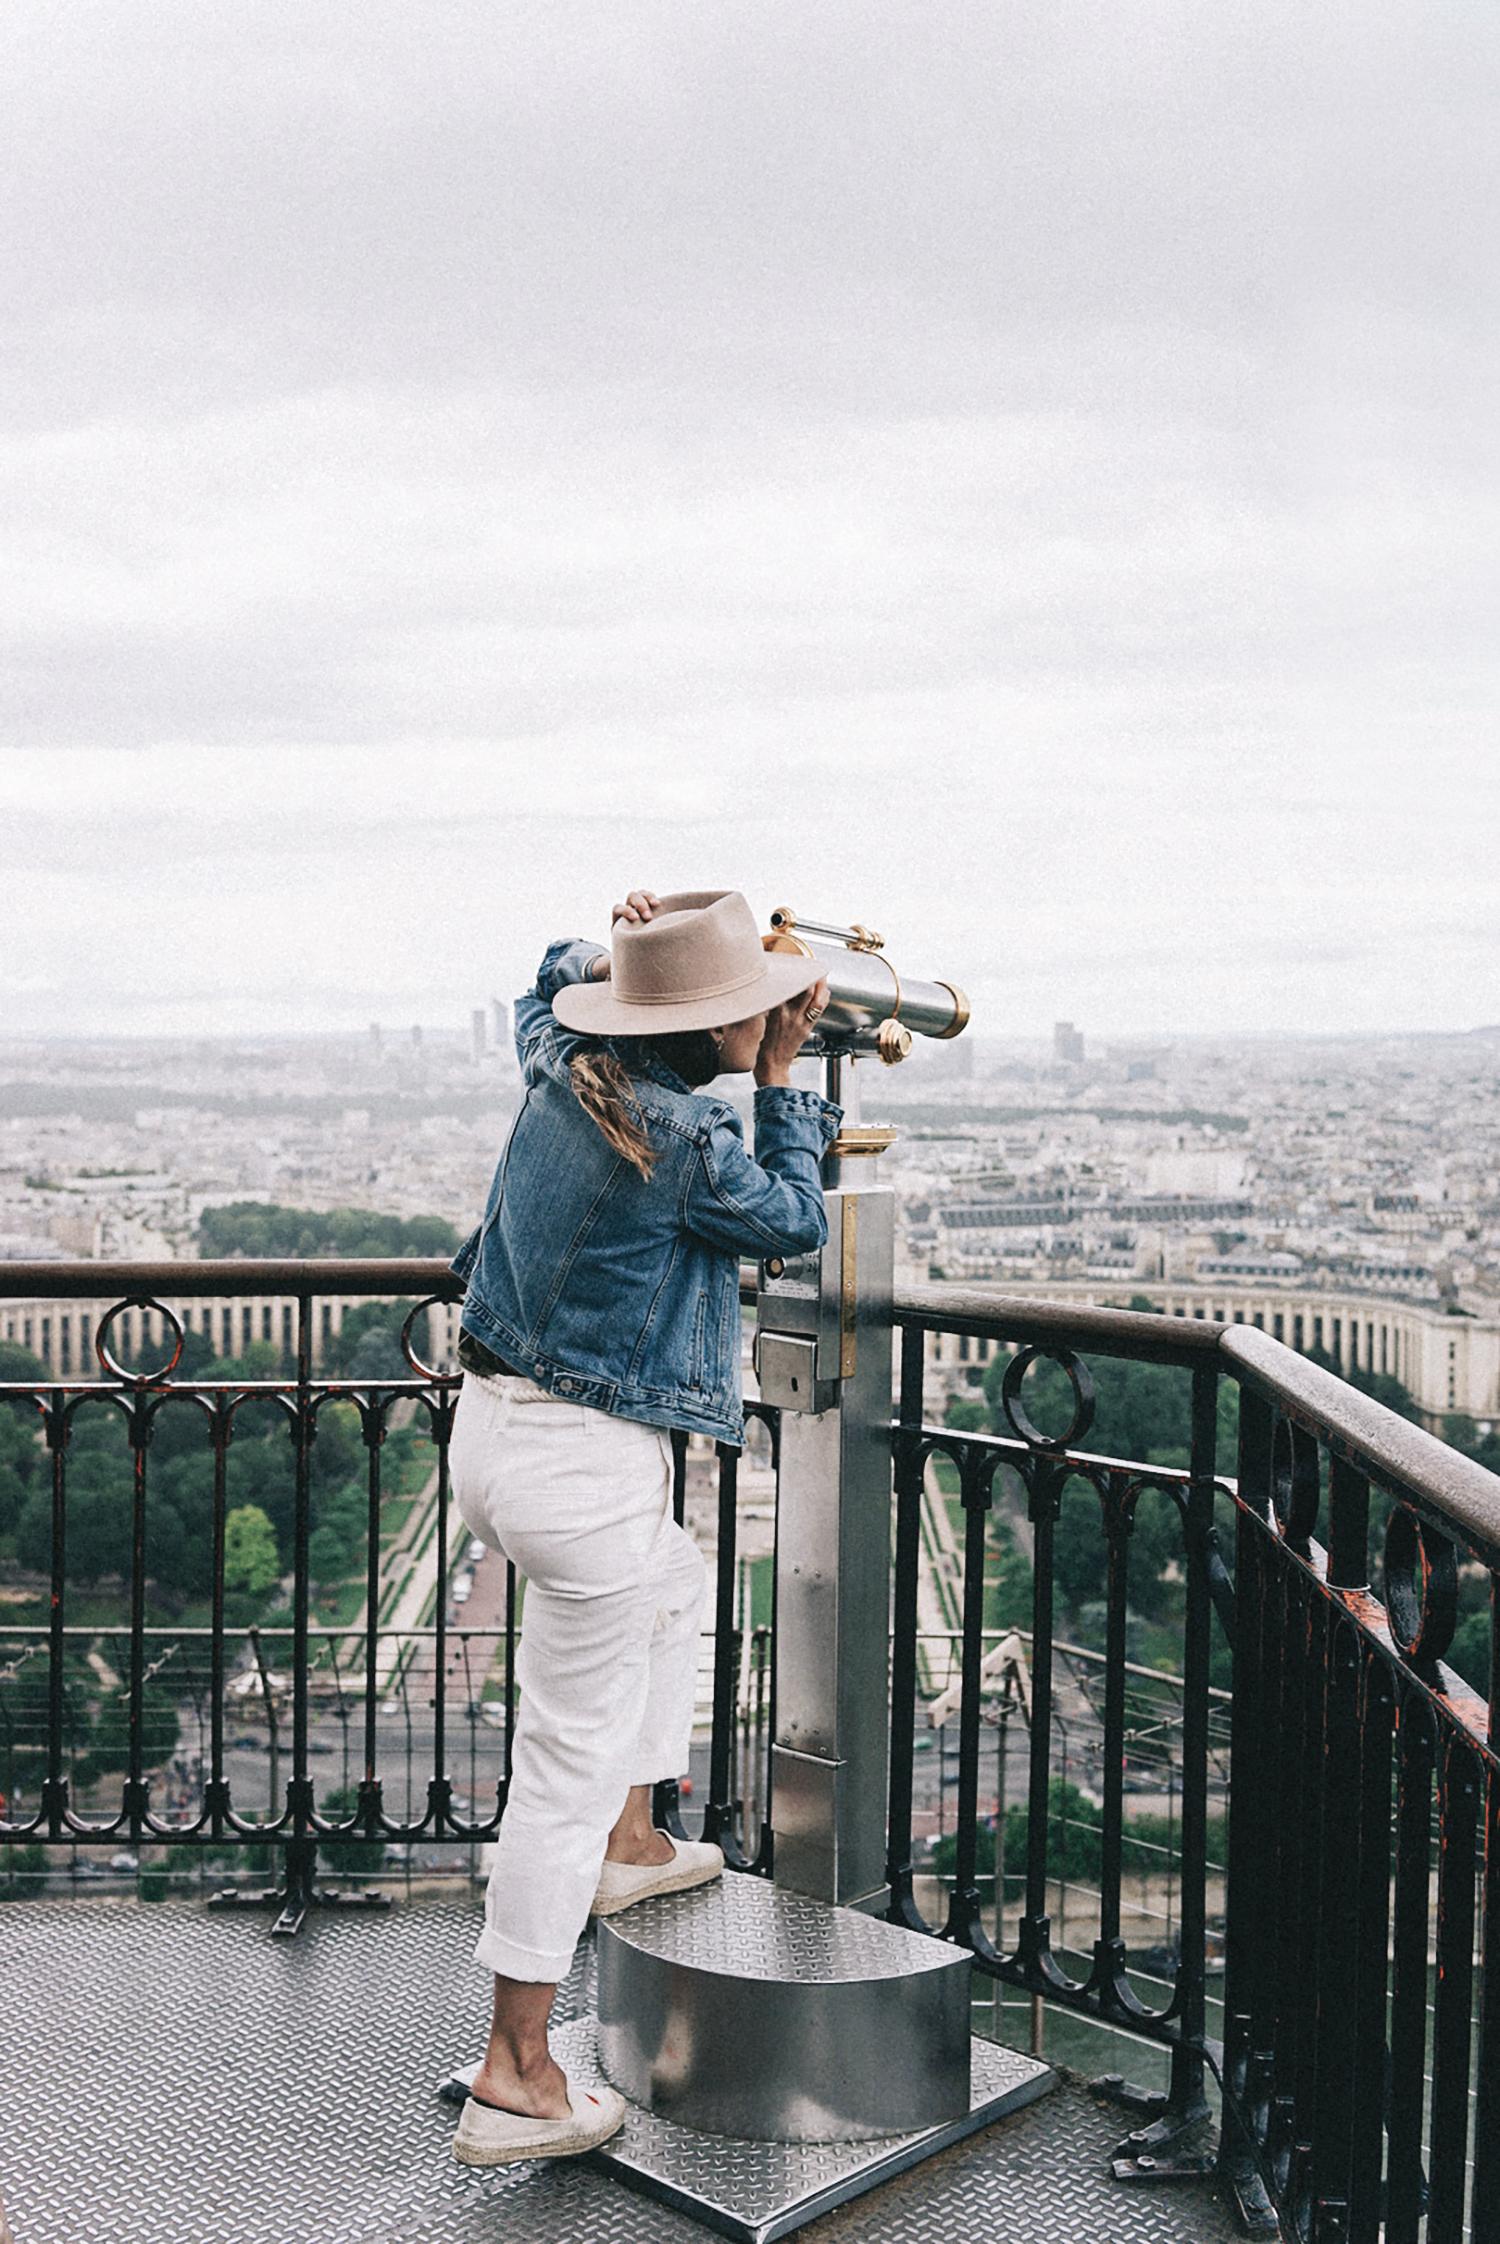 Home_Away_Paris-Tour_Eiffel-43